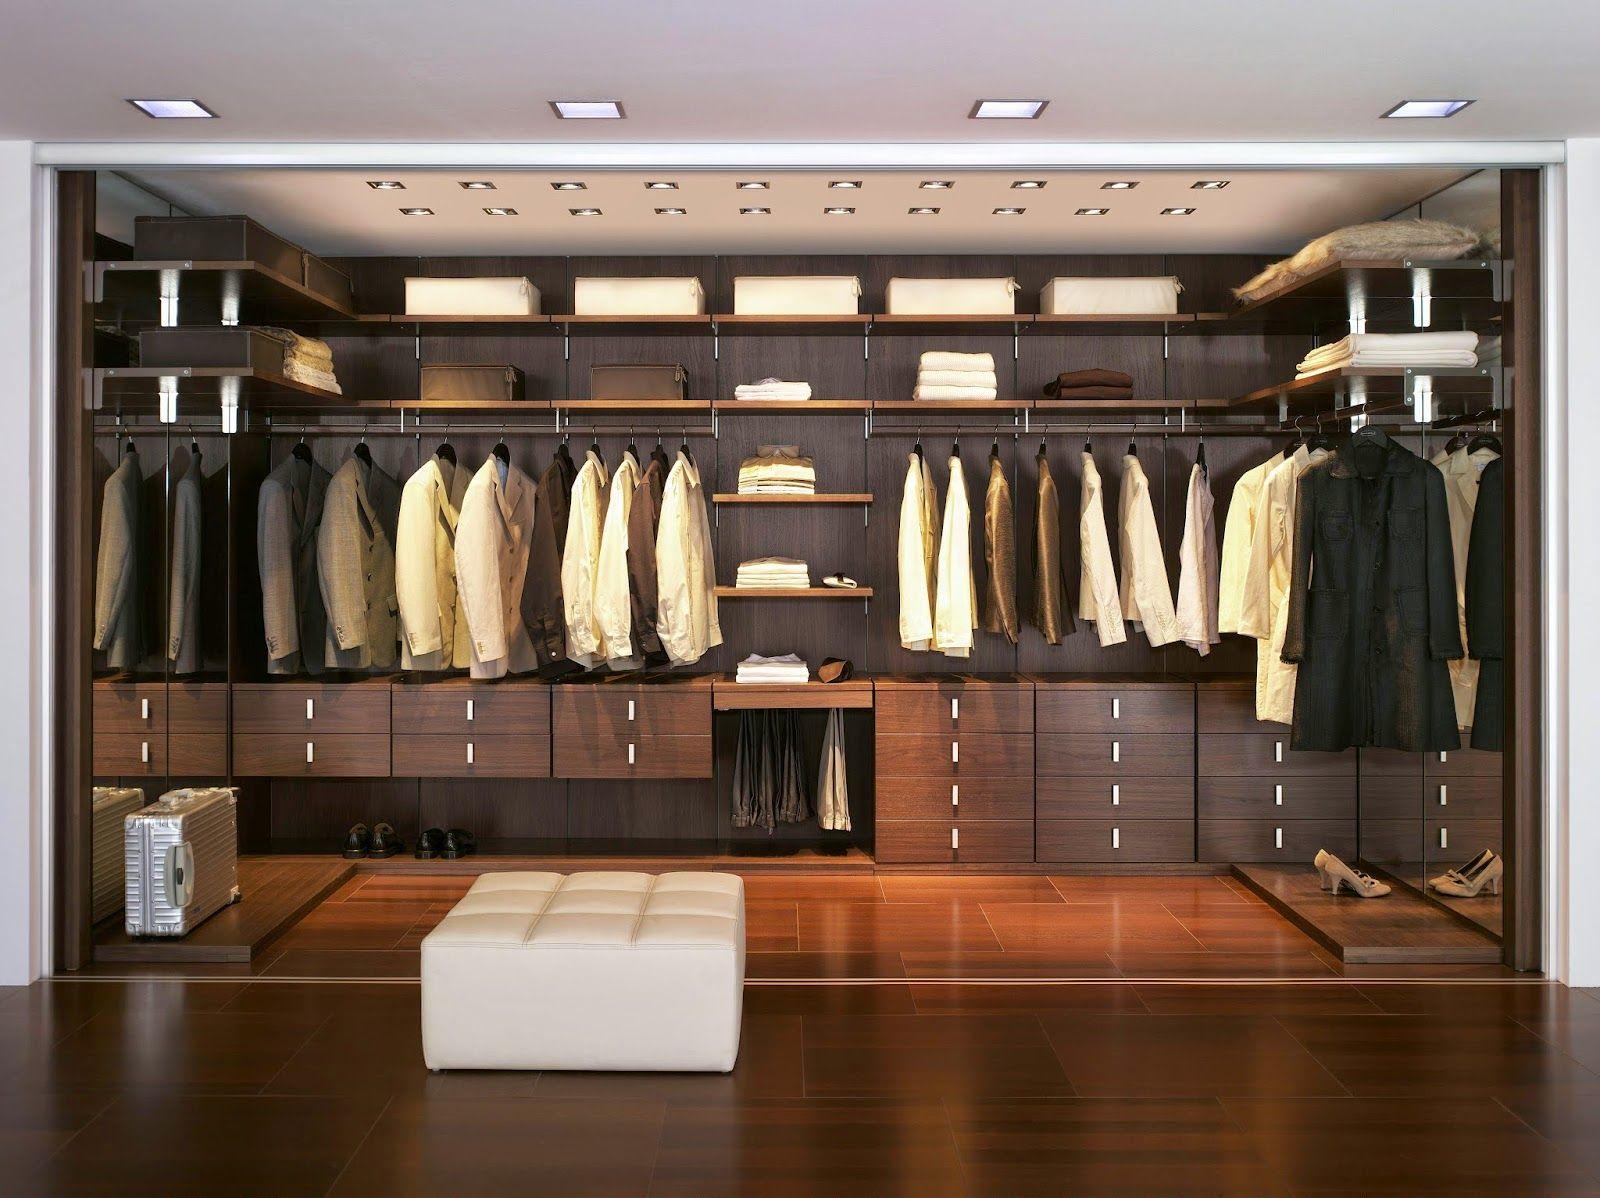 Bedroom Closets Designs Pleasing Small Bedroom Lighting Ideas  The Interior Designs  Wardrobe Design Ideas